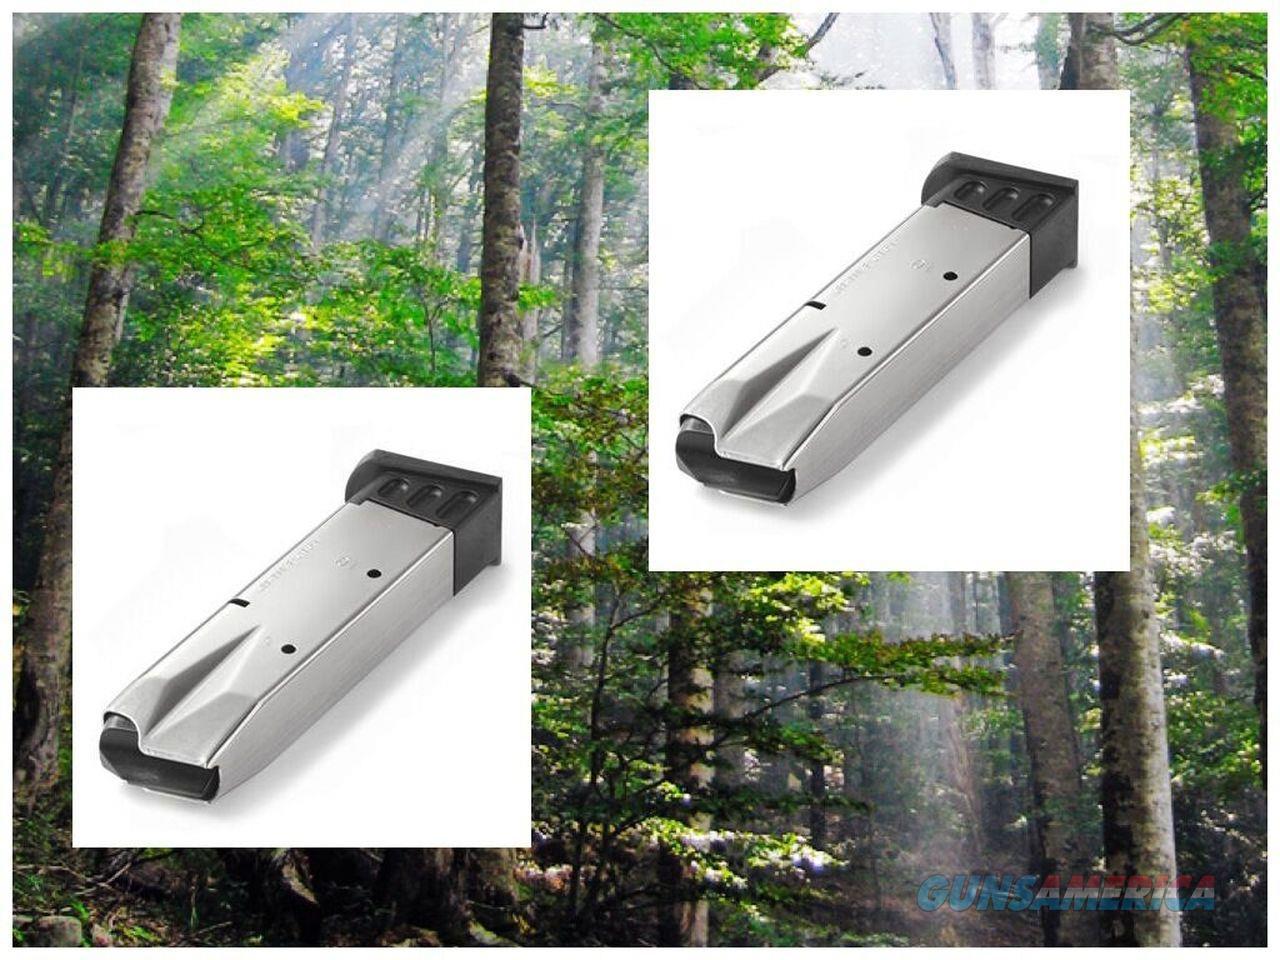 2-Pack TAURUS 92 & 99 GLOSS NICKEL 9mm 9 mm Pistol Mag 10 Round Magazine MECGAR  Non-Guns > Ammunition